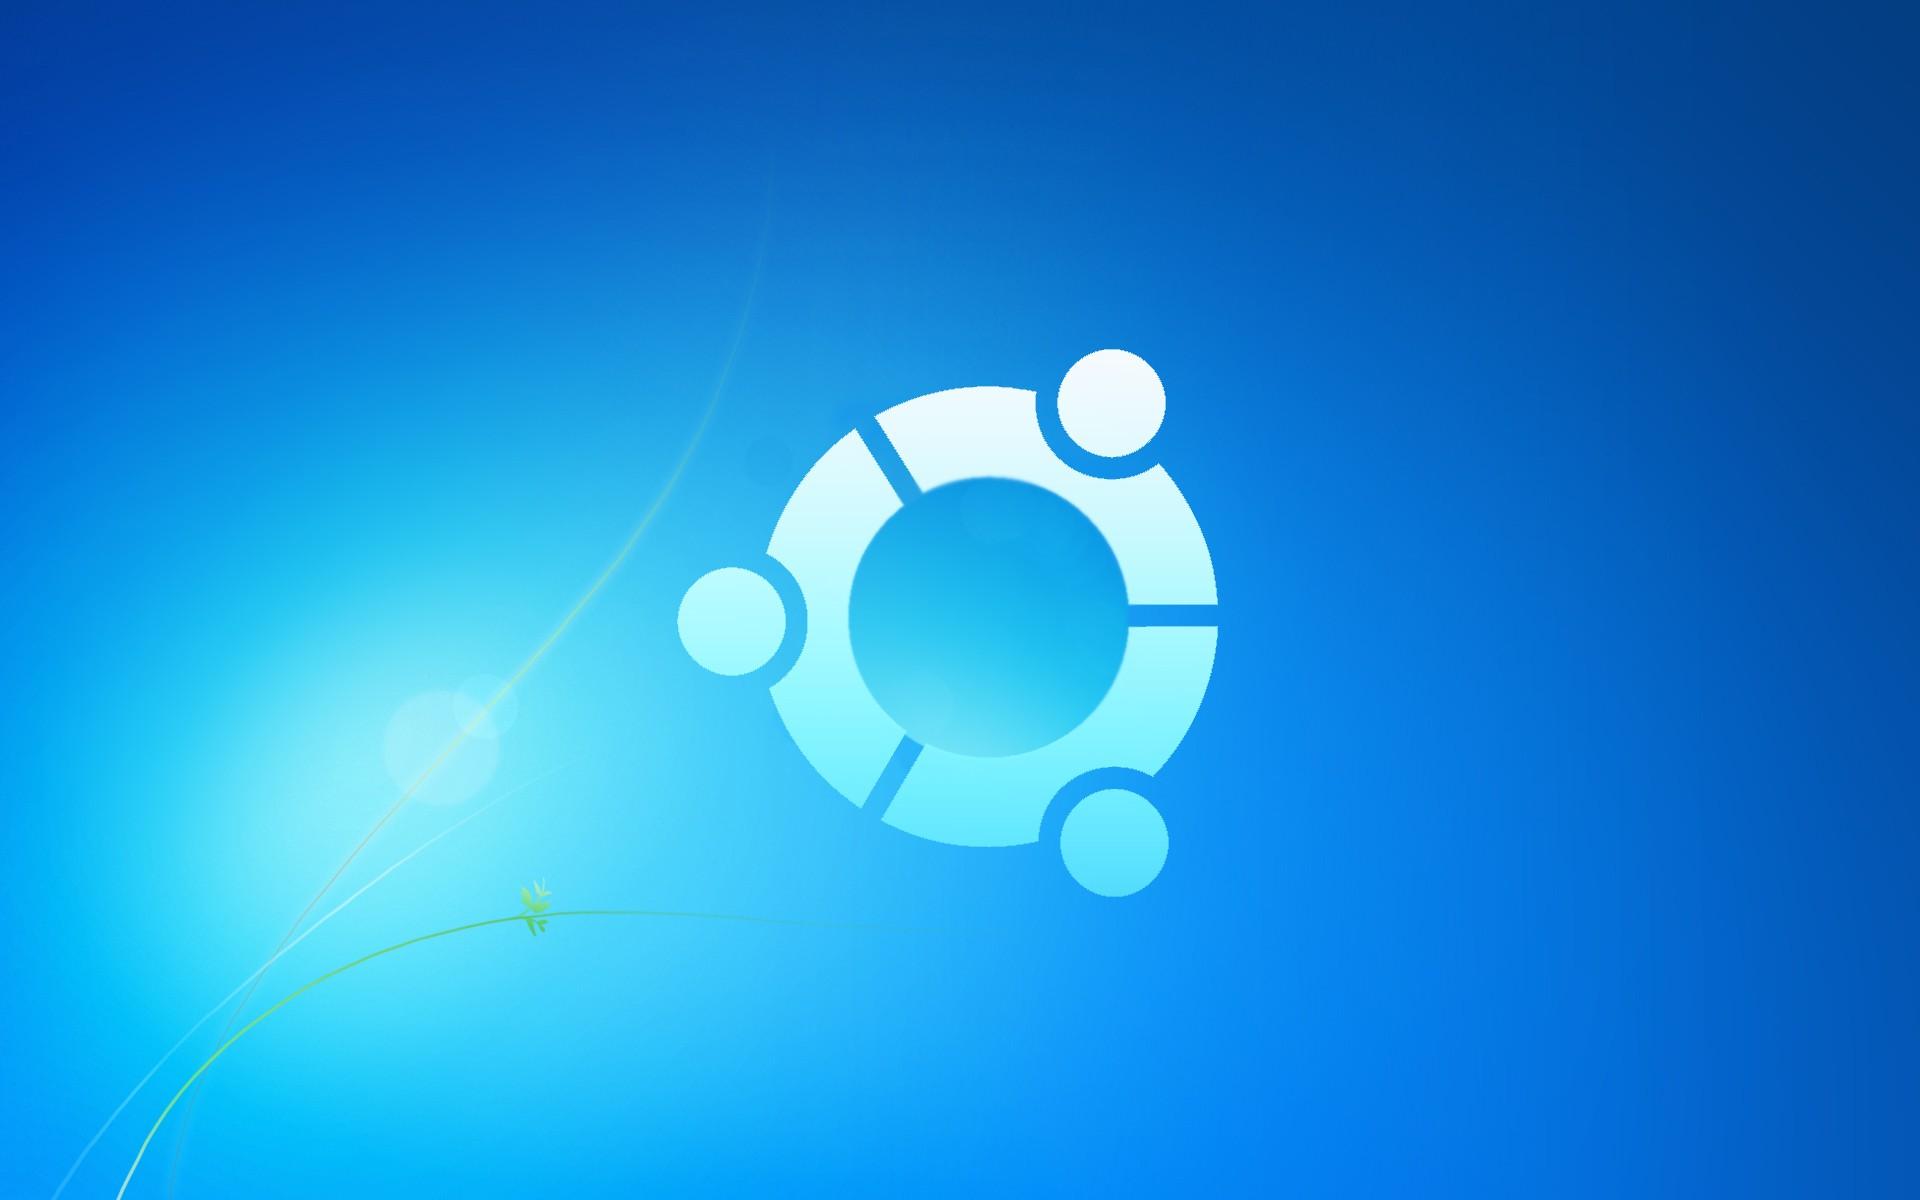 Linux Ubuntu Wallpaper 1920x1200 Linux Ubuntu Gnu GNU 1920x1200